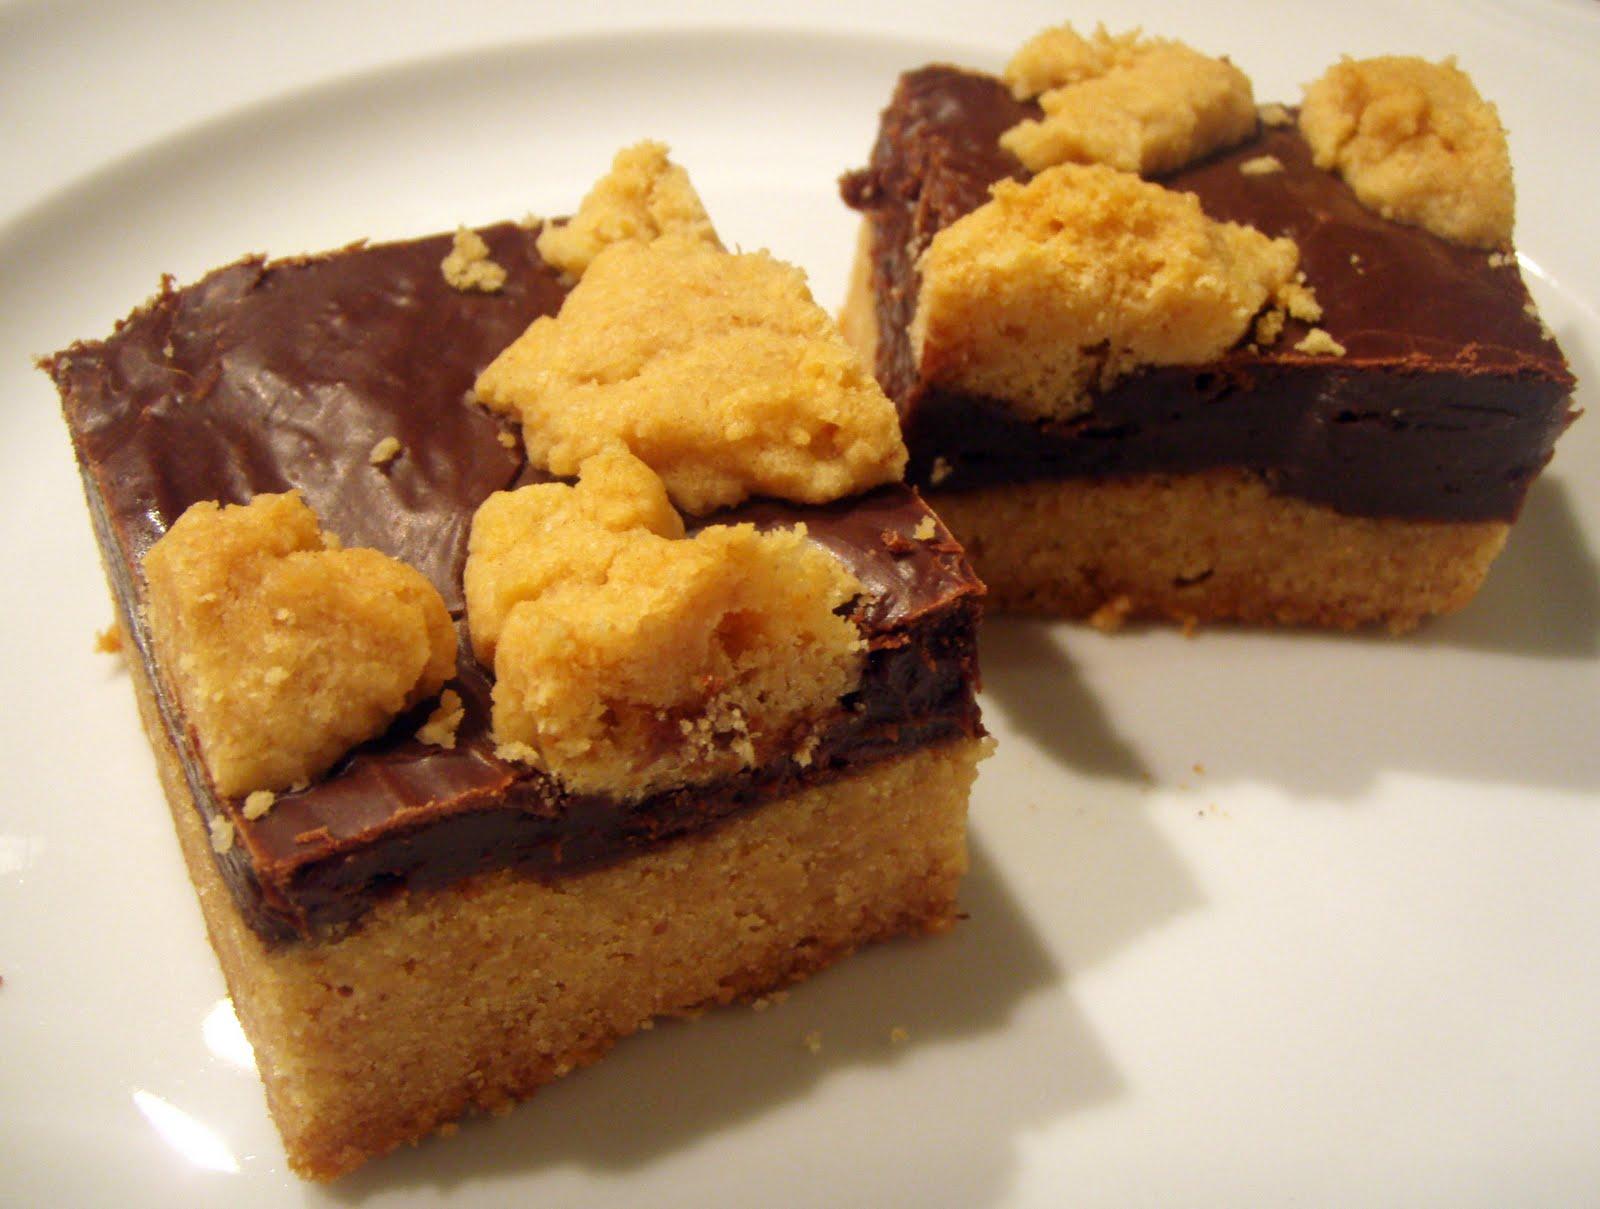 Pineapple Grass: Peanut Butter Fudge Bars